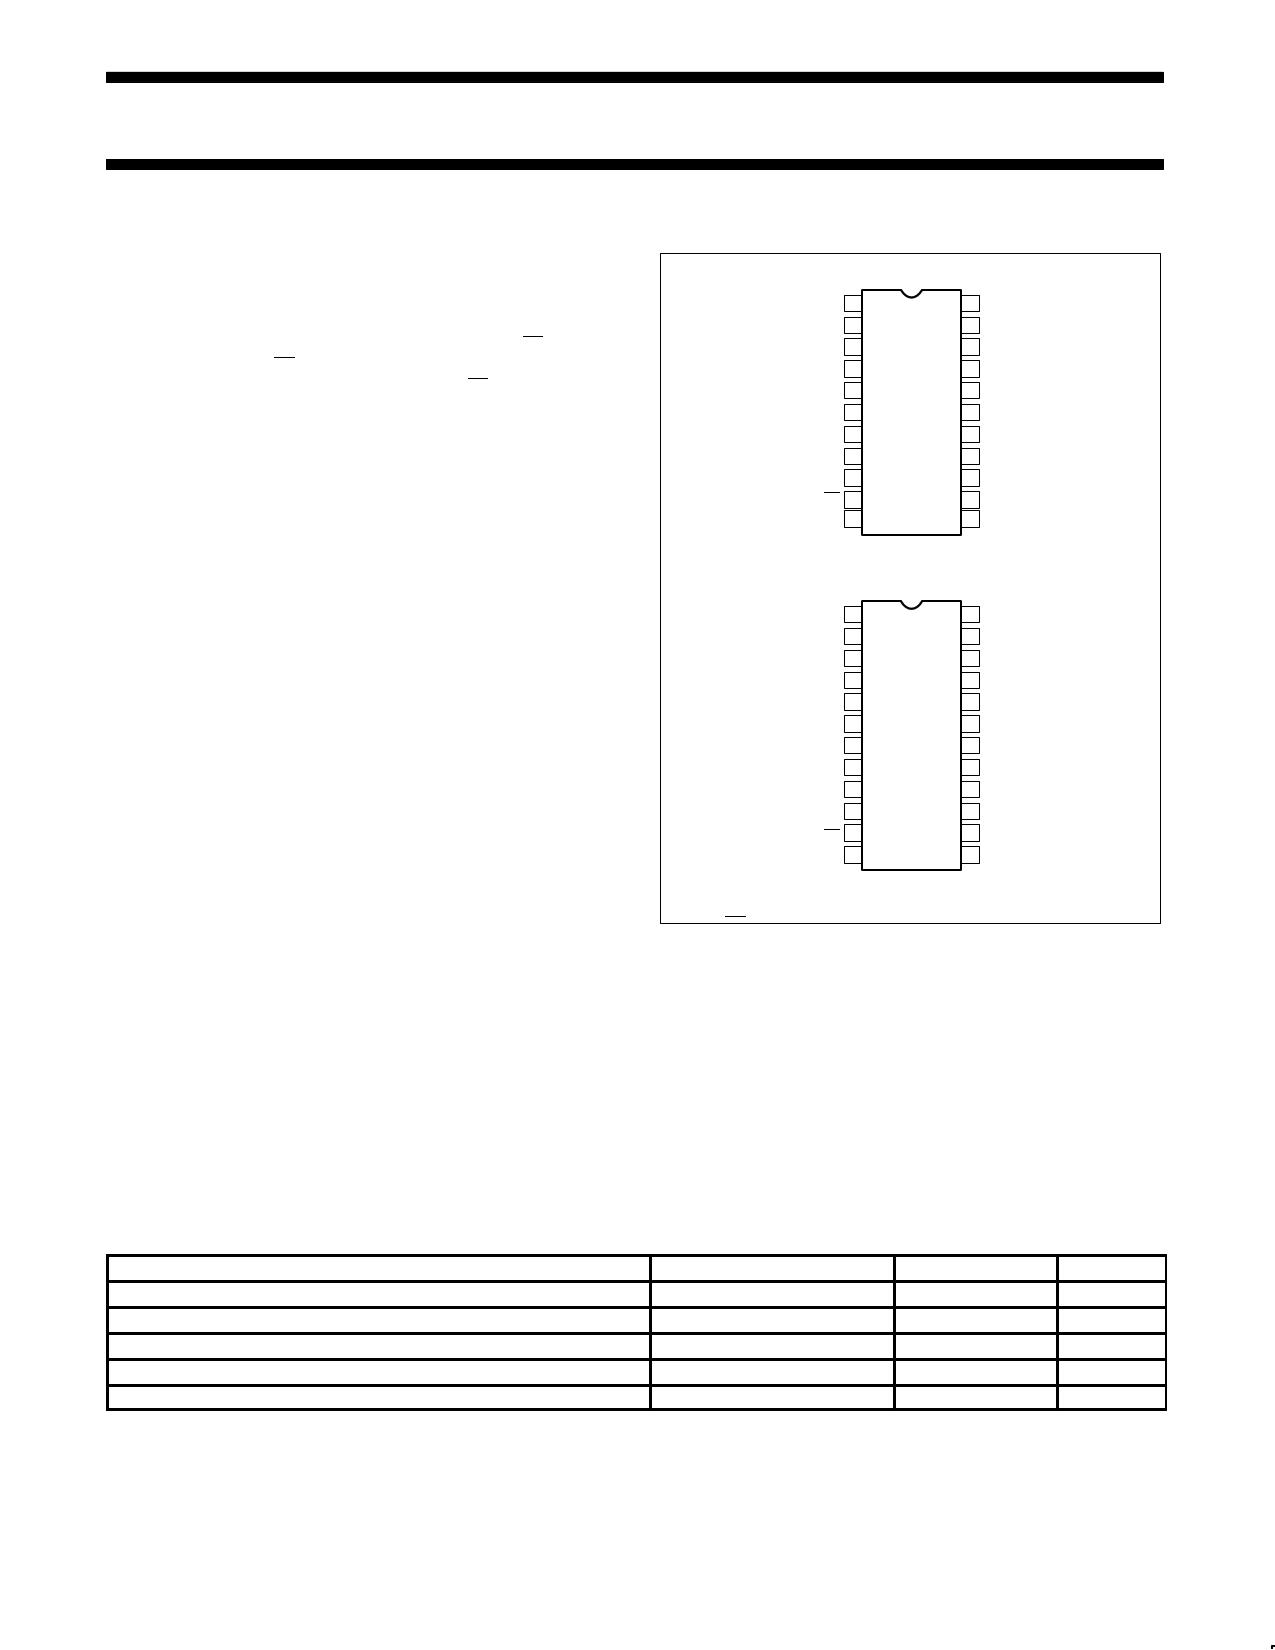 SE5019N 데이터시트 및 SE5019N PDF